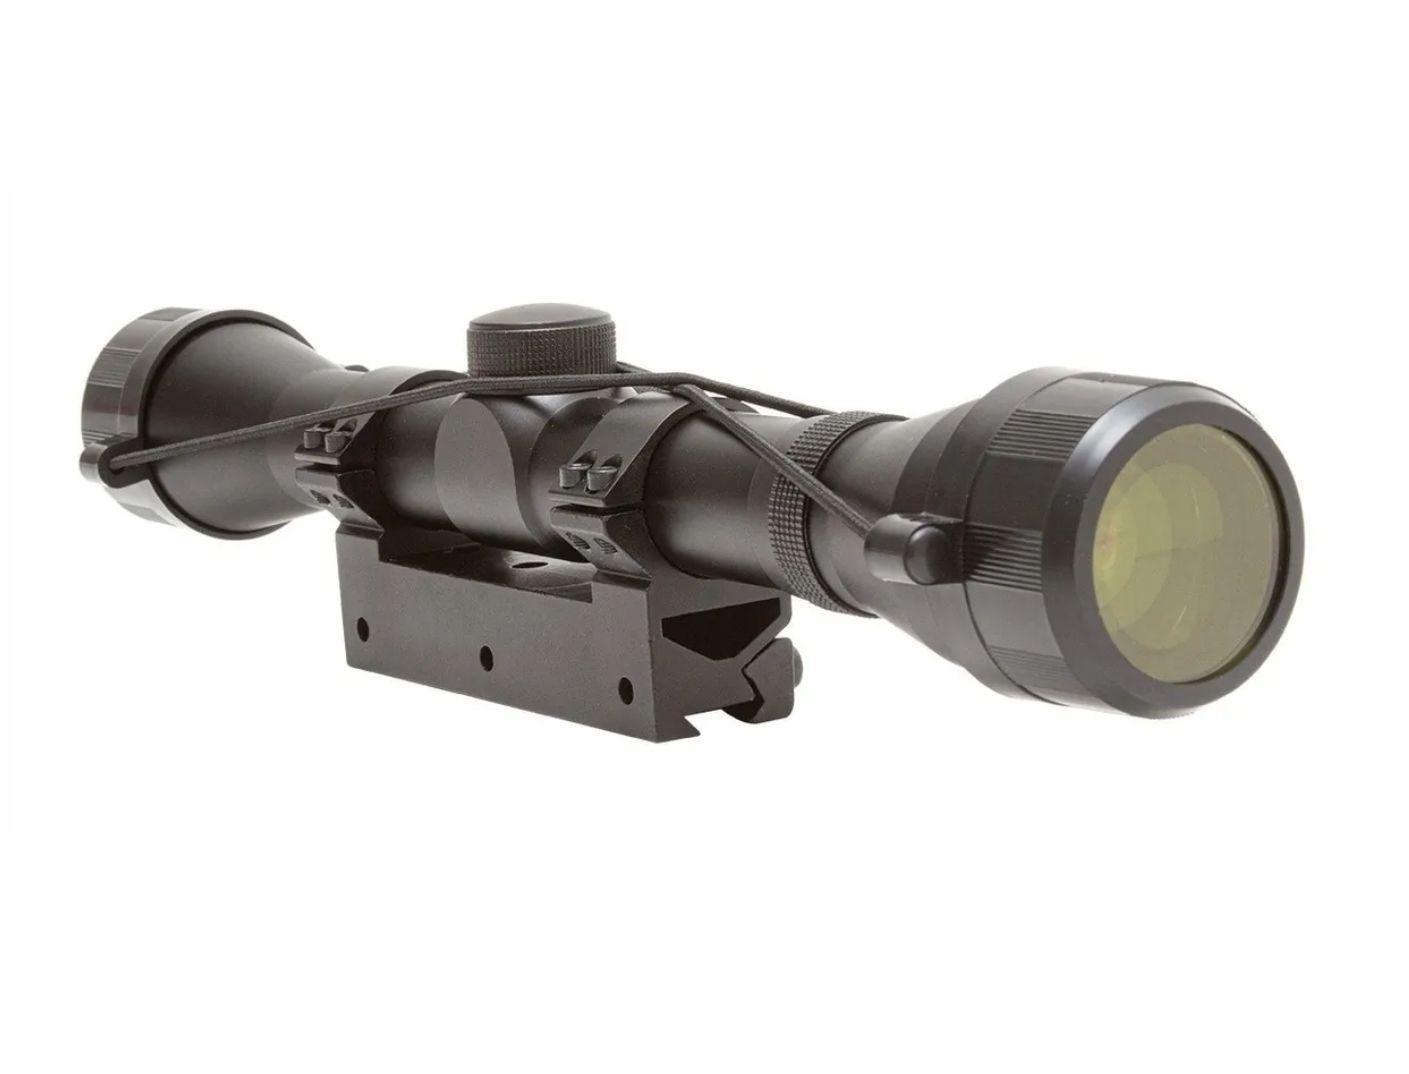 Carabina Hatsan 5,5mm HT130 QE Colete Walter+ Luneta 4x32